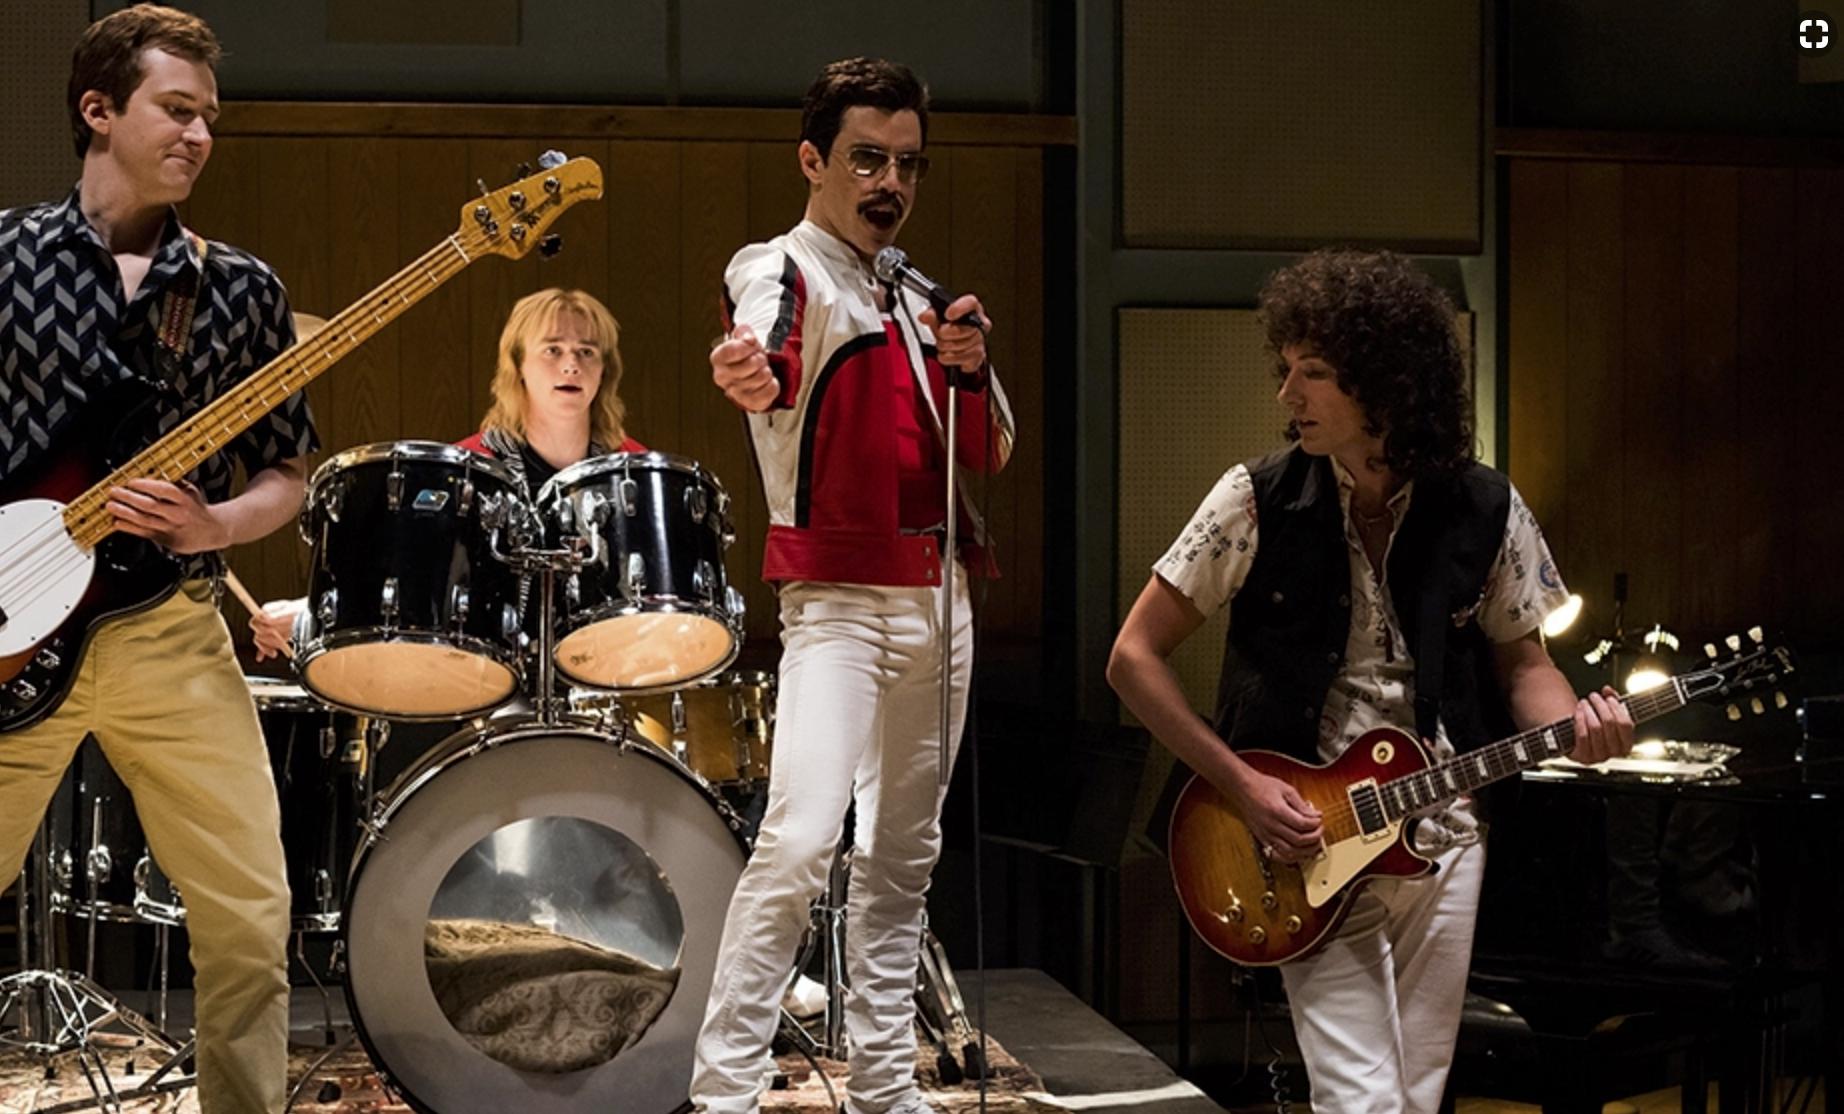 Joseph Mazzello, Ben Hardy, Rami Malek, Gwilym Lee in  Bohemian Rhapsody  (2018) - 20th Century Fox